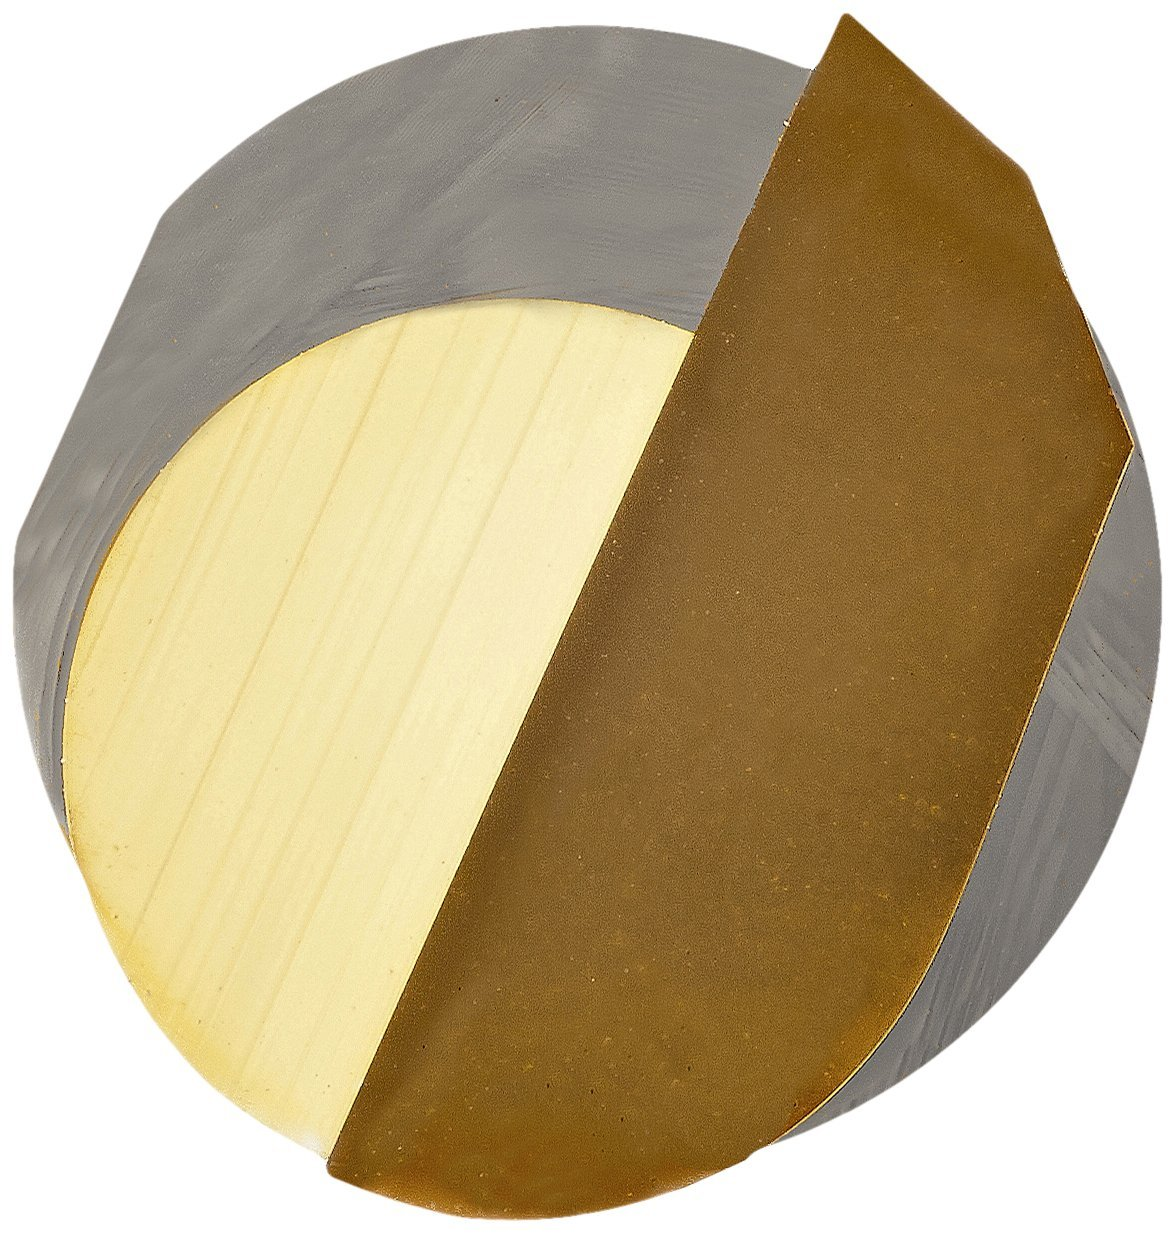 No Cutting Radius 1//2 Shank Diameter 0.123 Projection BB-4904500SG 4.500 Maximum Bore Depth TiN Coated Right Hand Boring Tool 6 Overall Length Micro 100 Solid Carbide Tool 0.490 Minimum Bore Diameter